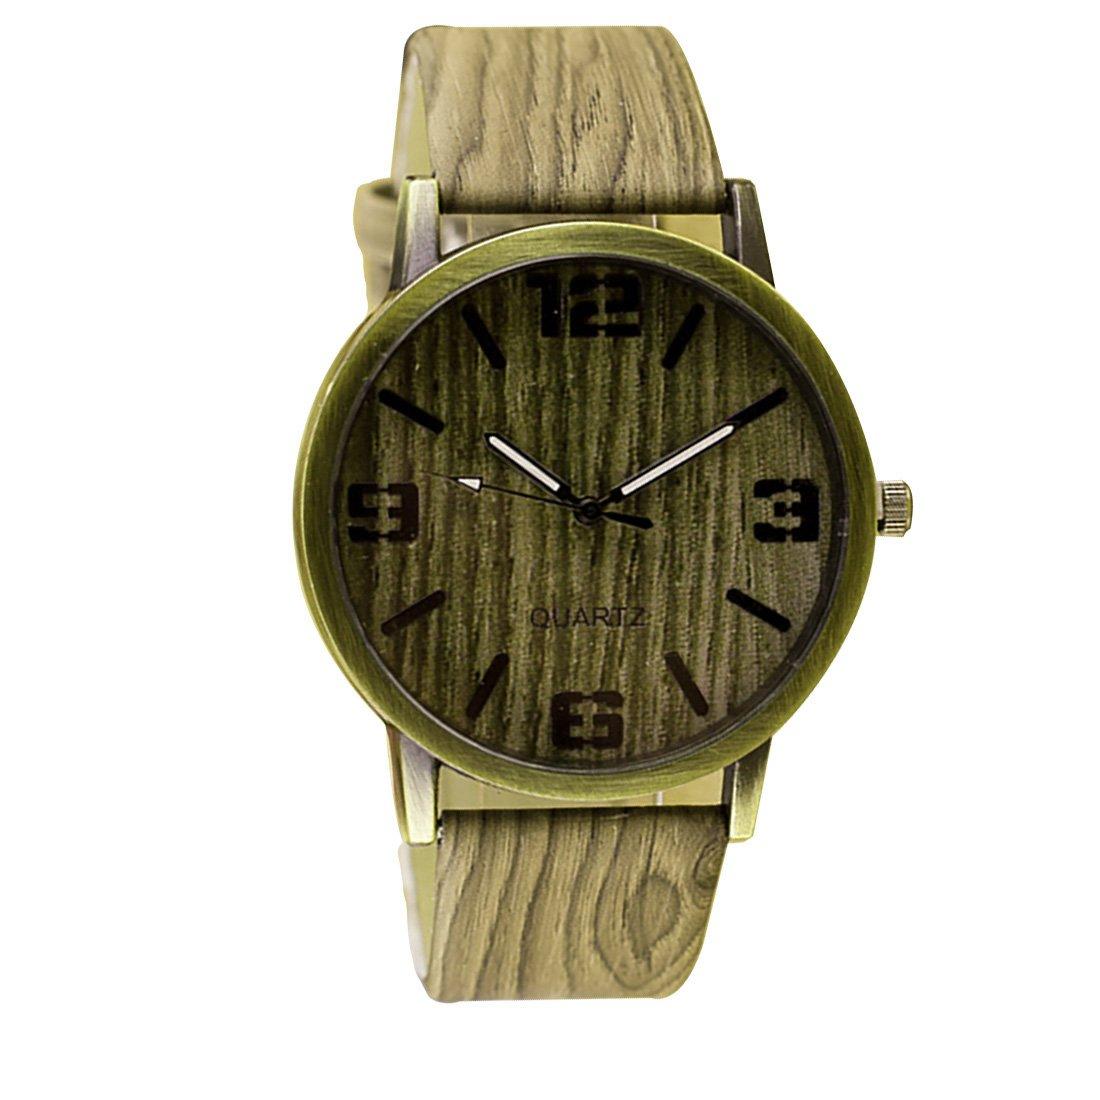 Amazon.com: 2016 Classical Wooden Watch Women Wristwatches Vintage Style Men Dress Watch Pu Leather Quartz Watch 5#: Watches